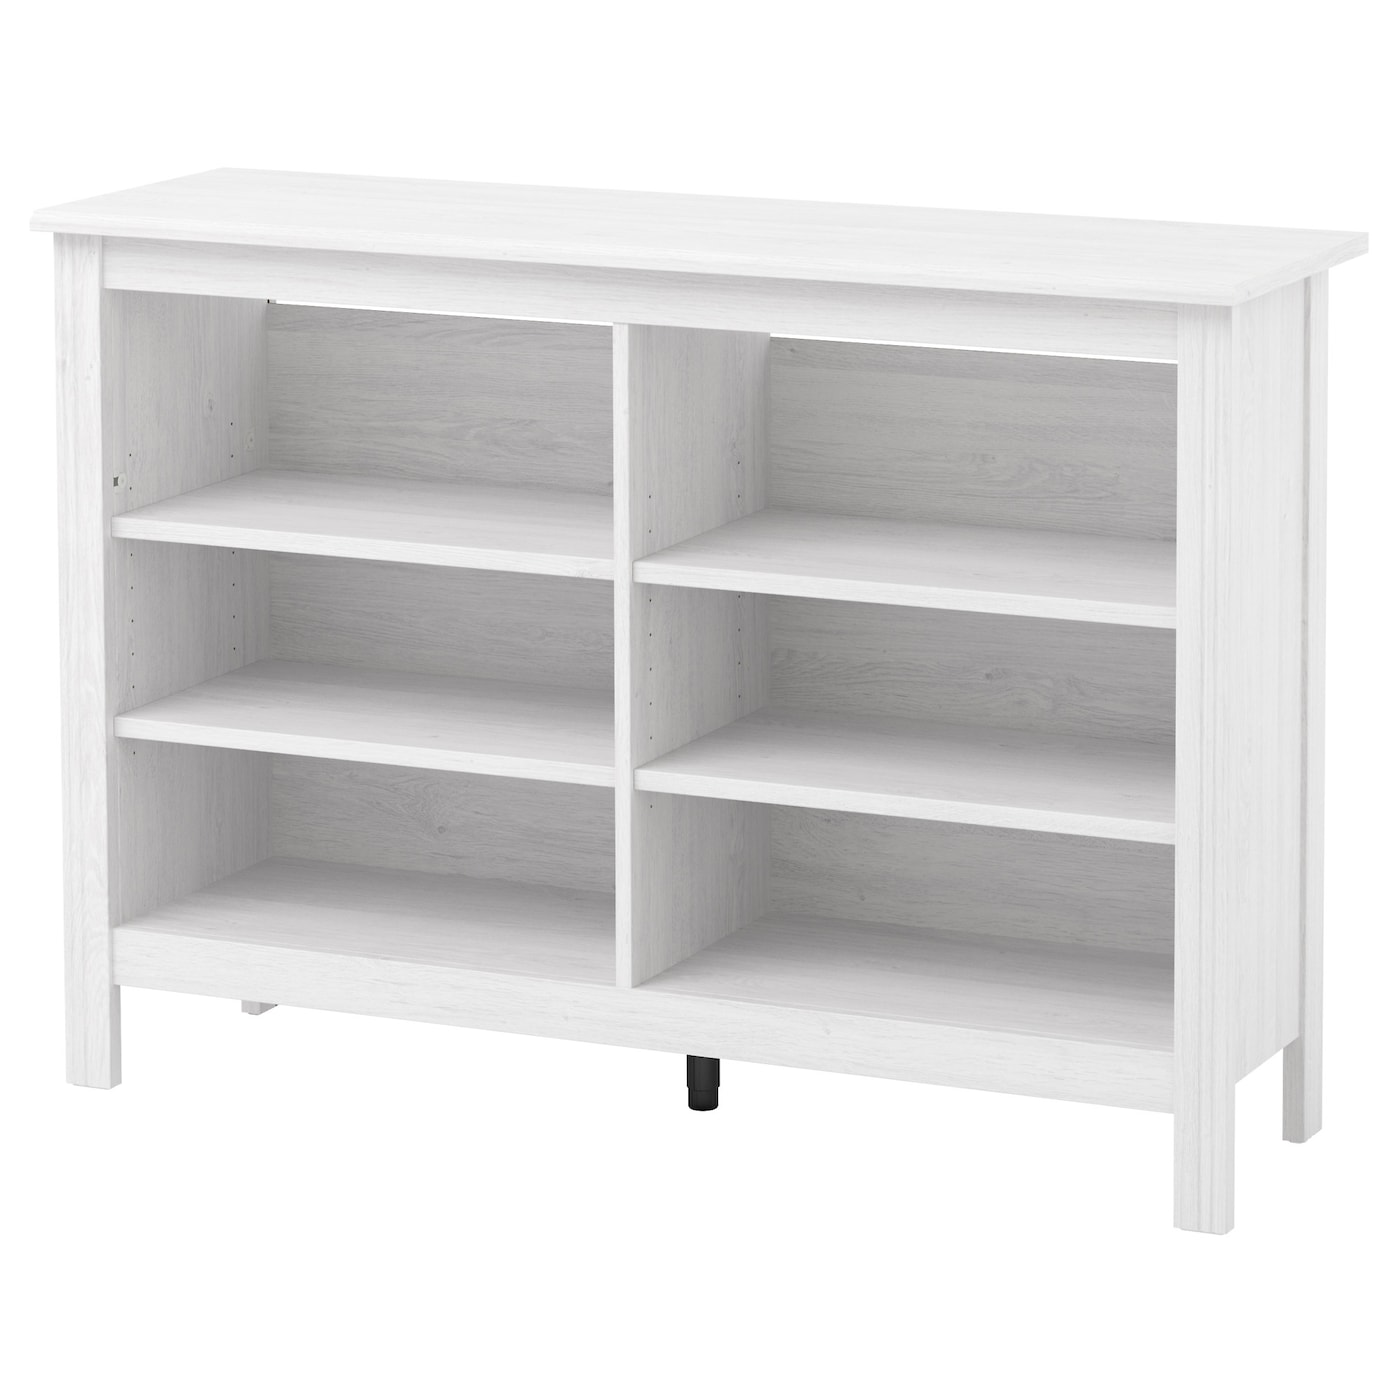 BRUSALI TV-Bank - IKEA